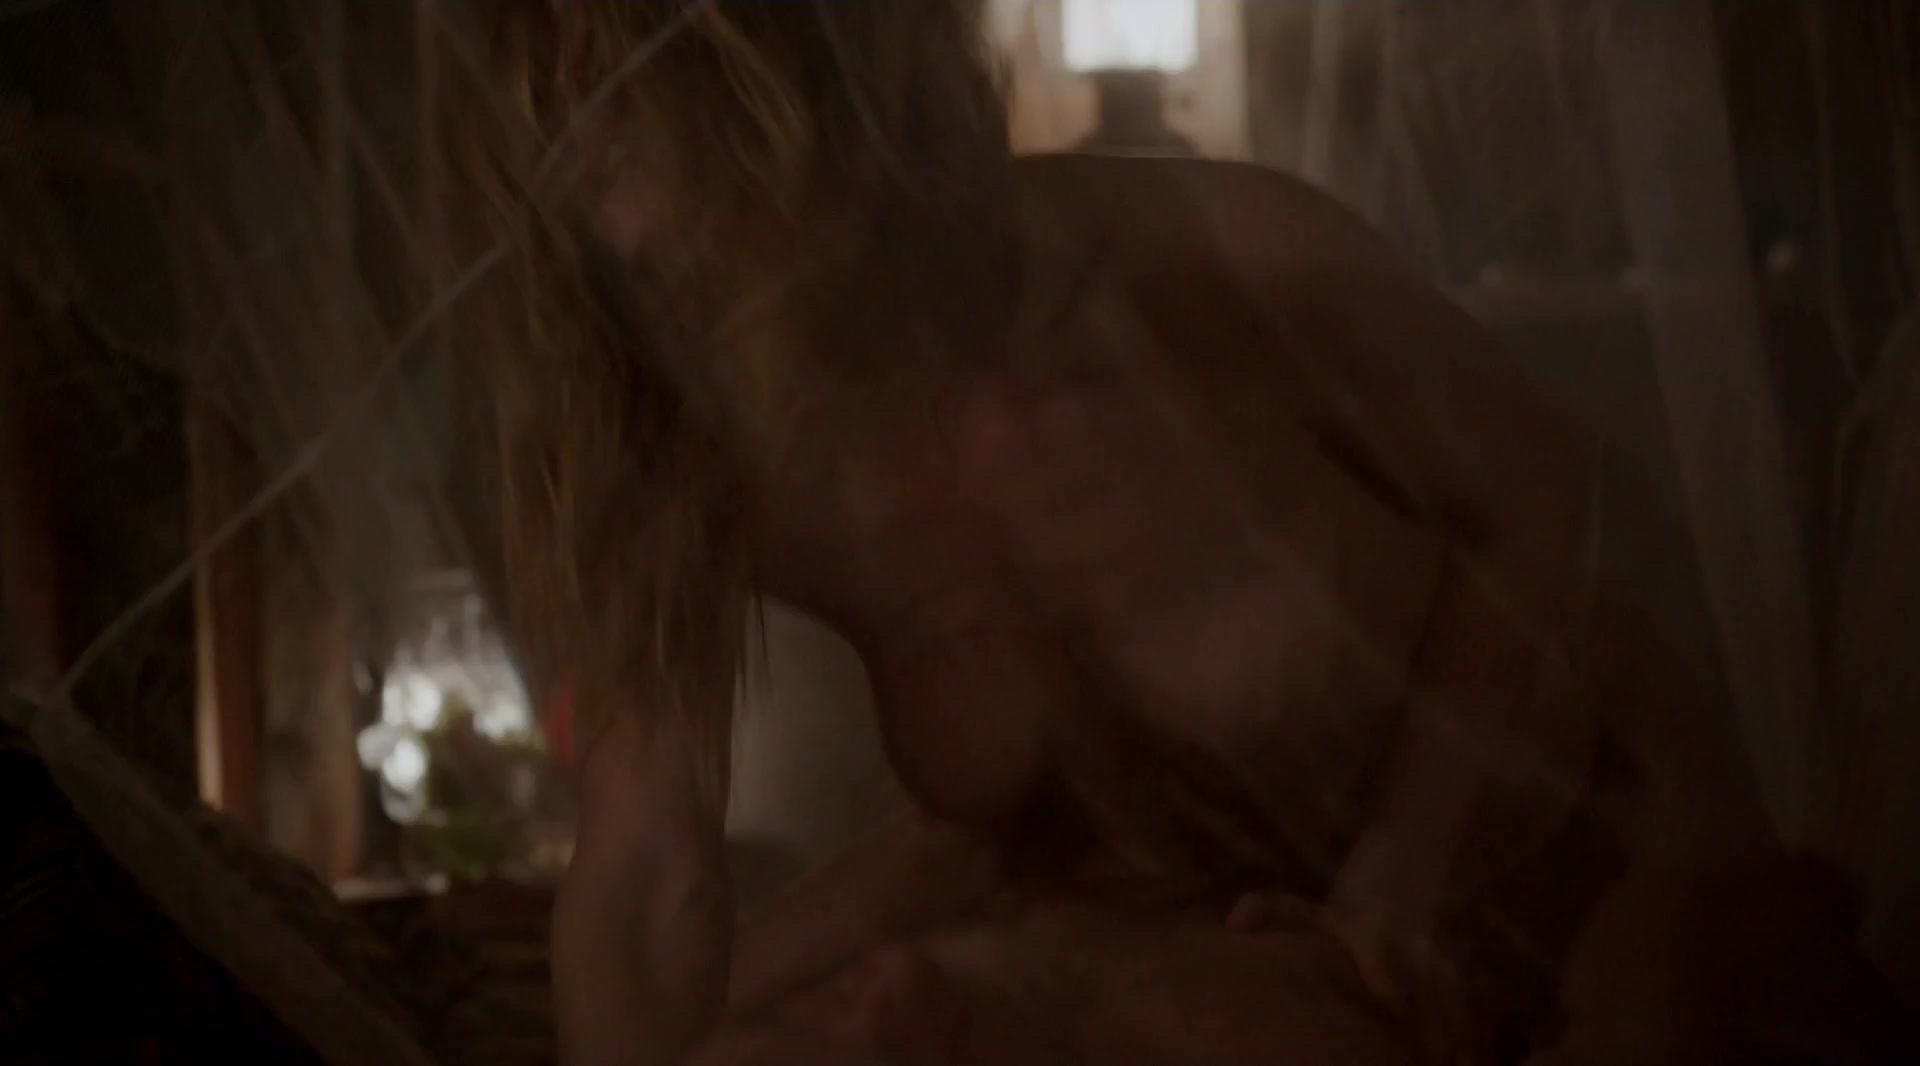 Is There Nudity In Shameless bojana novakovic - shameless s05e12 (2015) video » best sexy